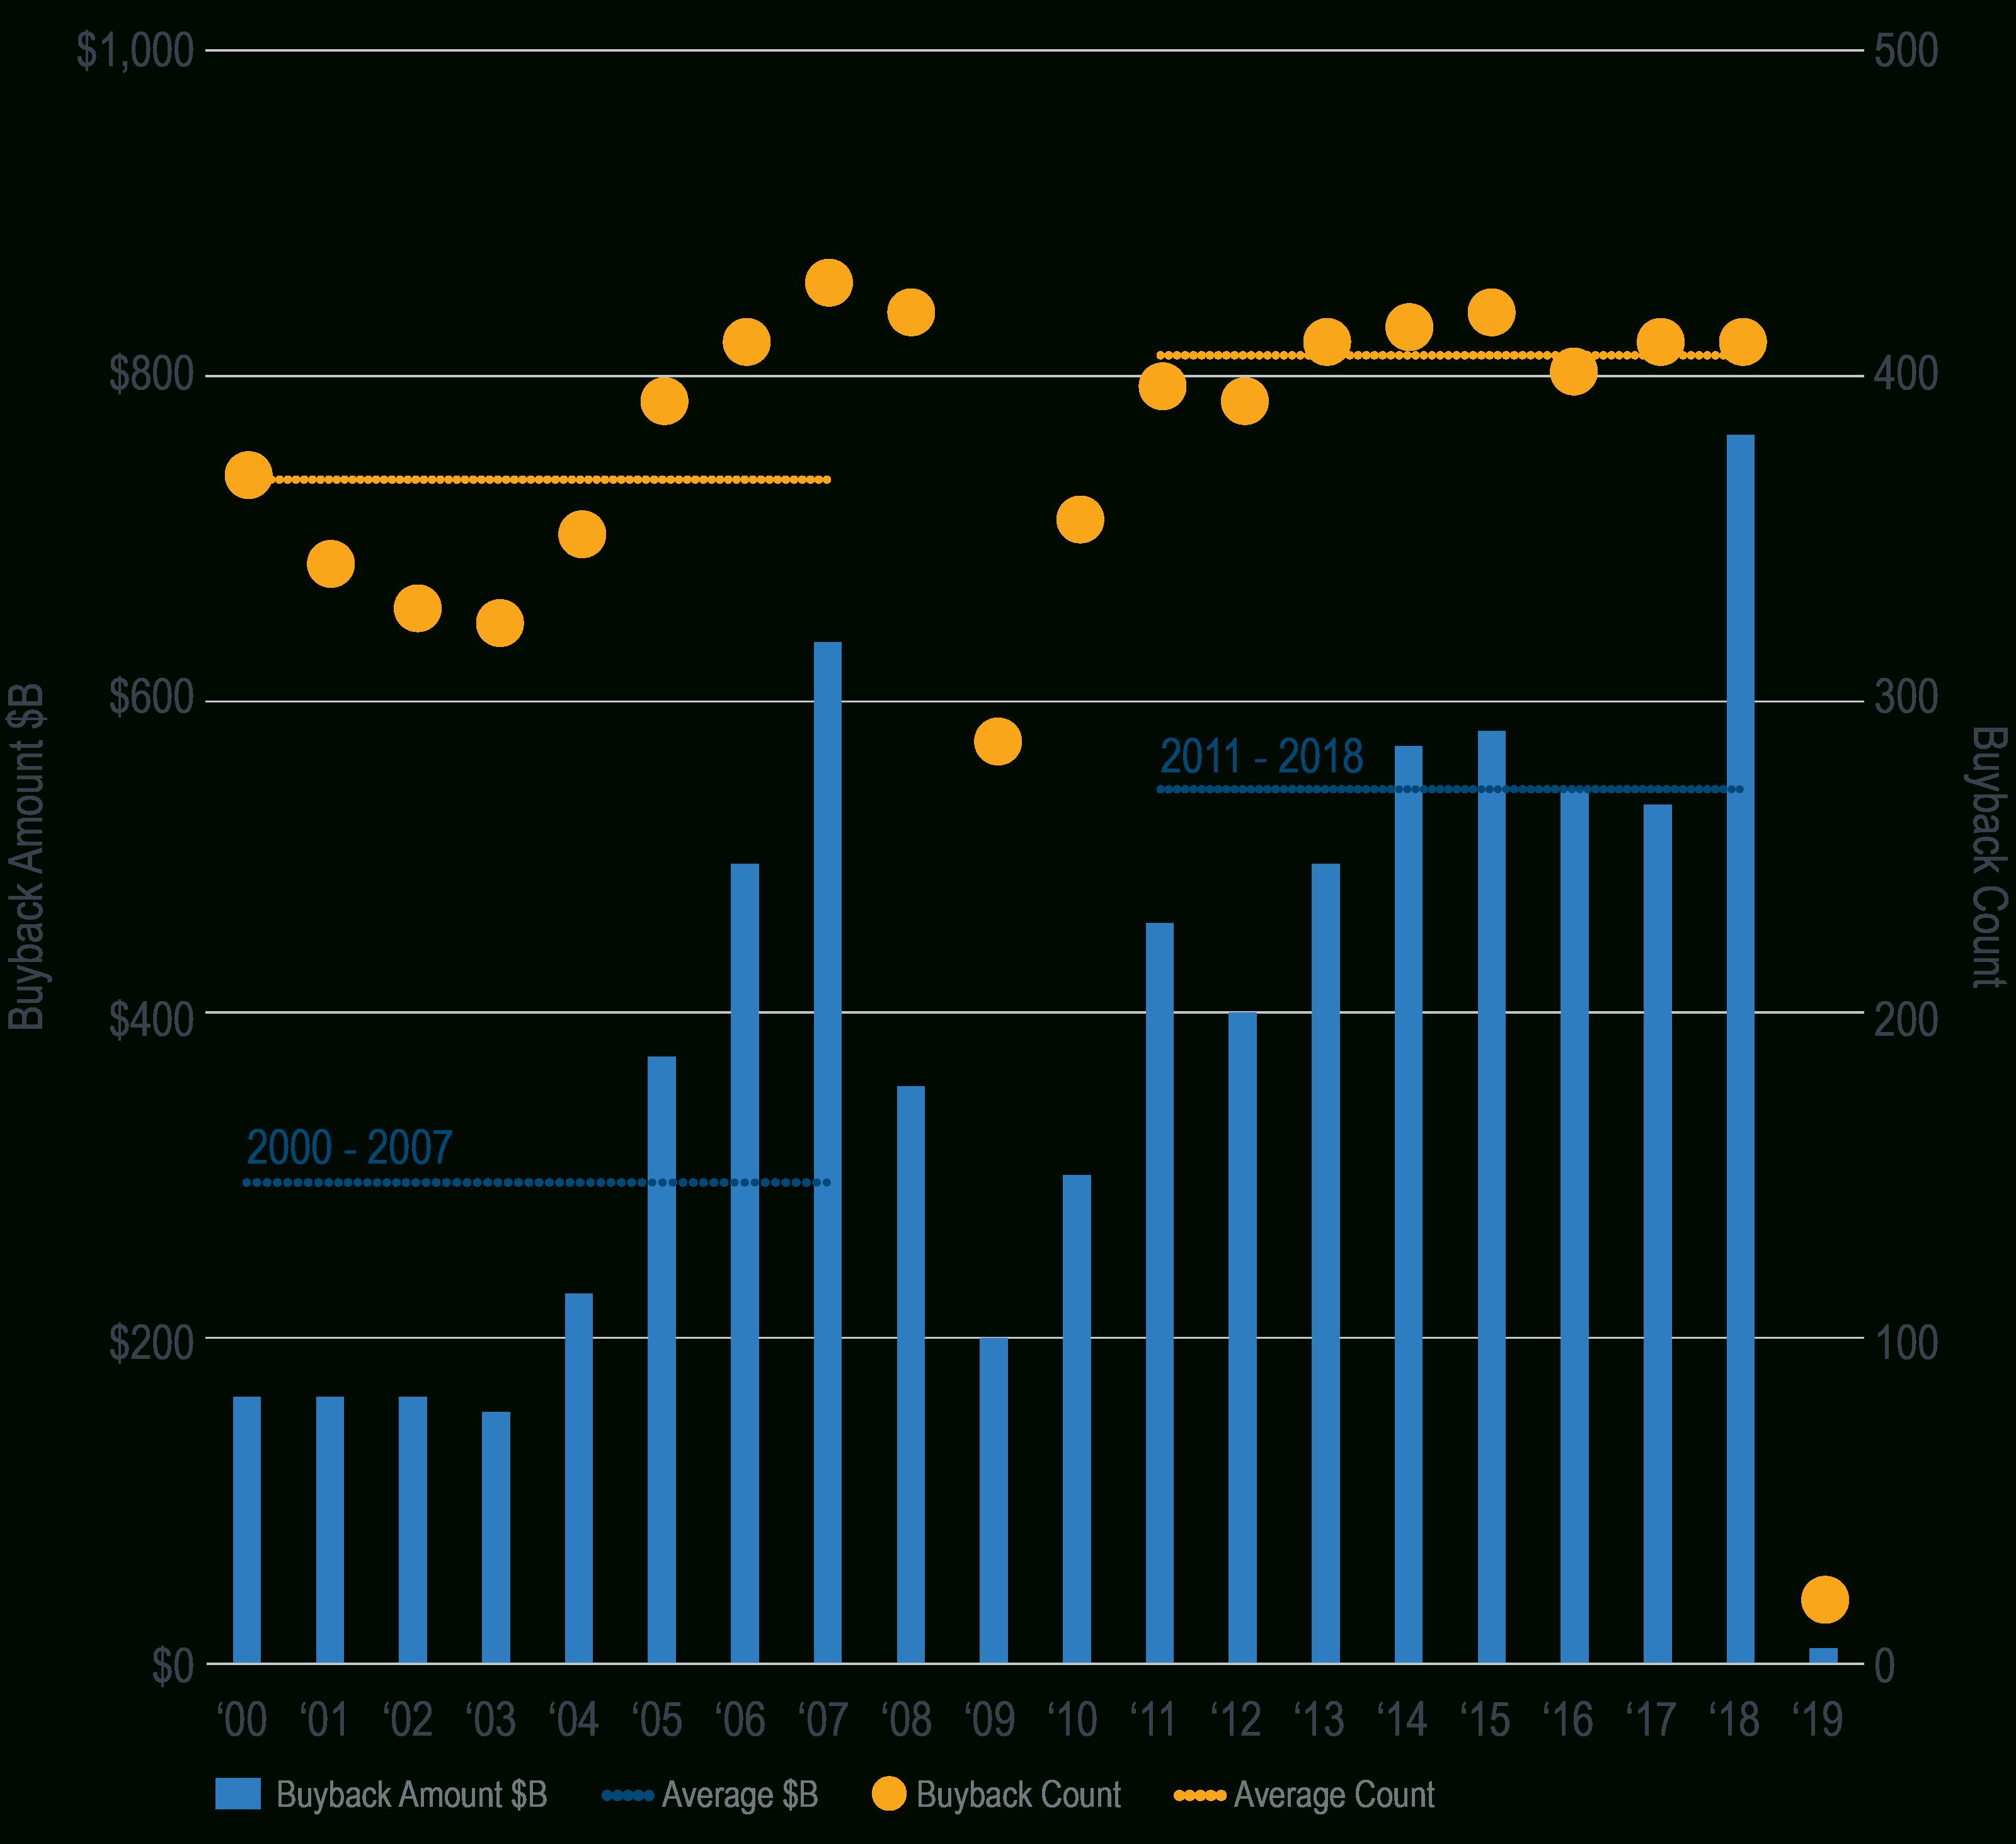 Calendar Year S&p 500 Stock Buybacks - Milliman Frm